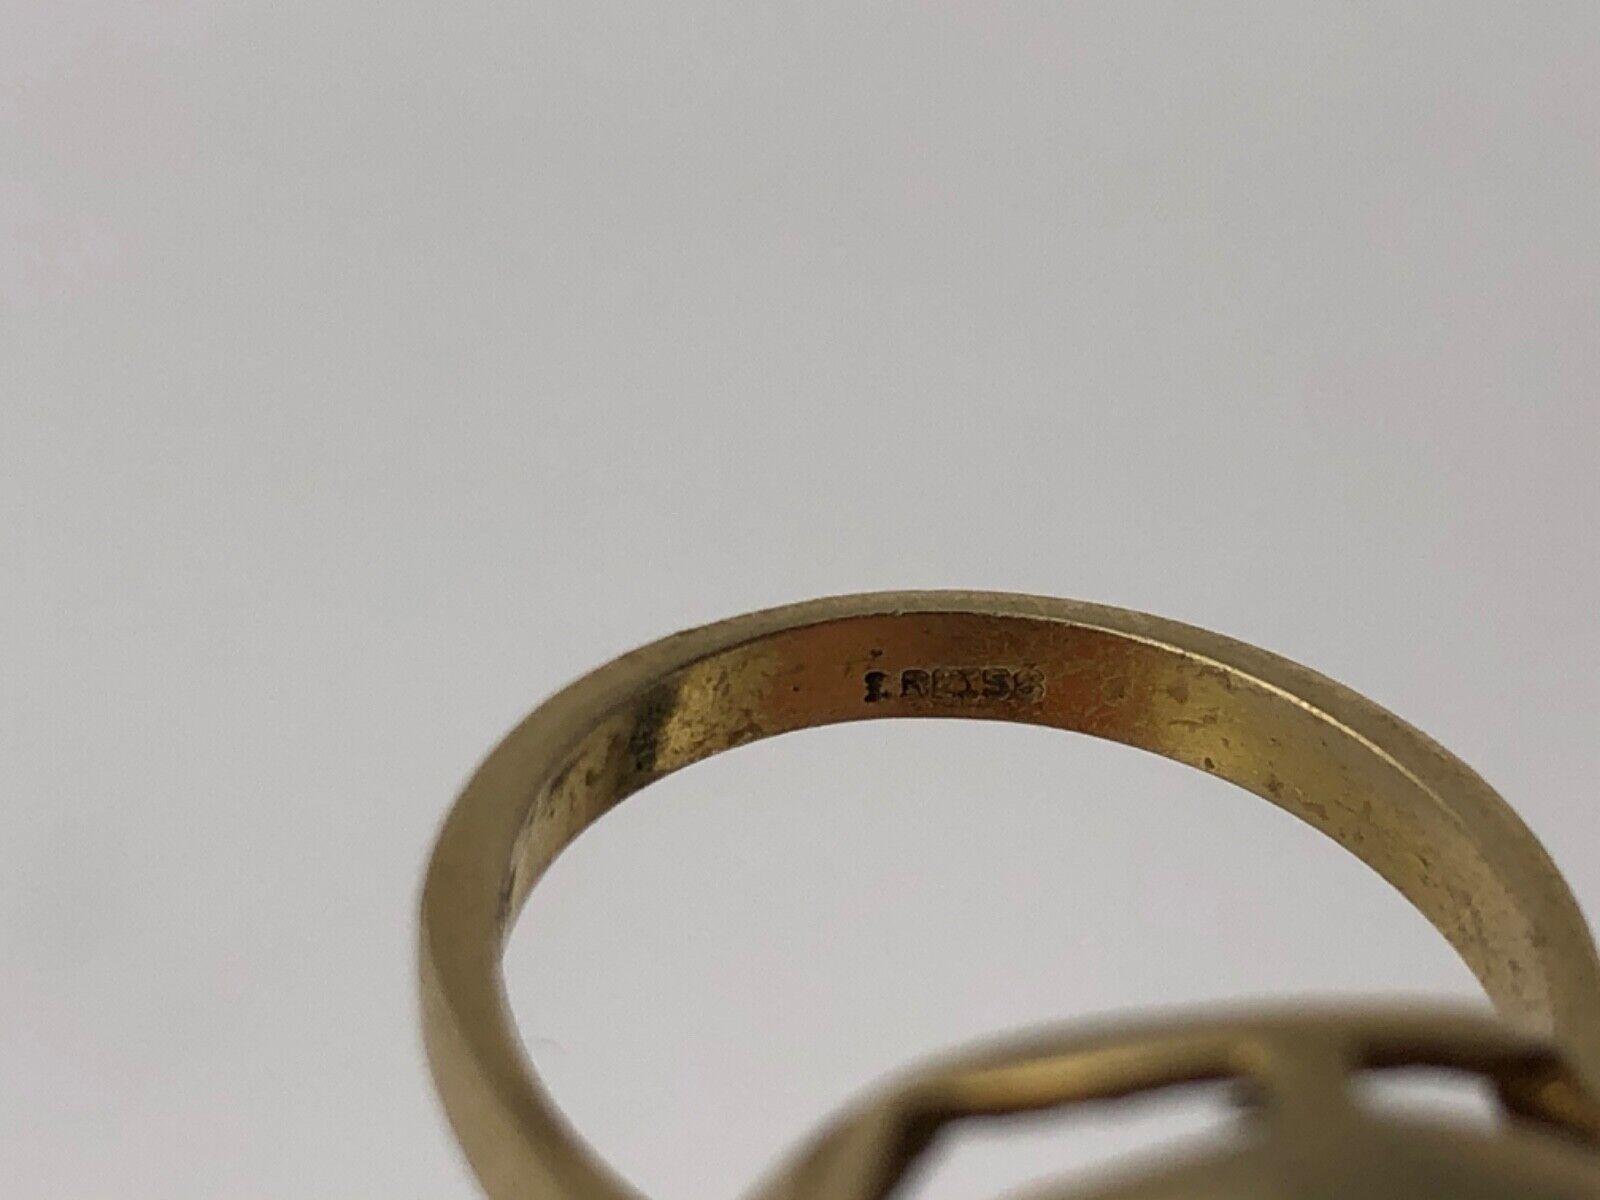 London Designer I Reiss Gold, Diamond, And Rutile Quartz Cocktail Ring 14k - $675.00